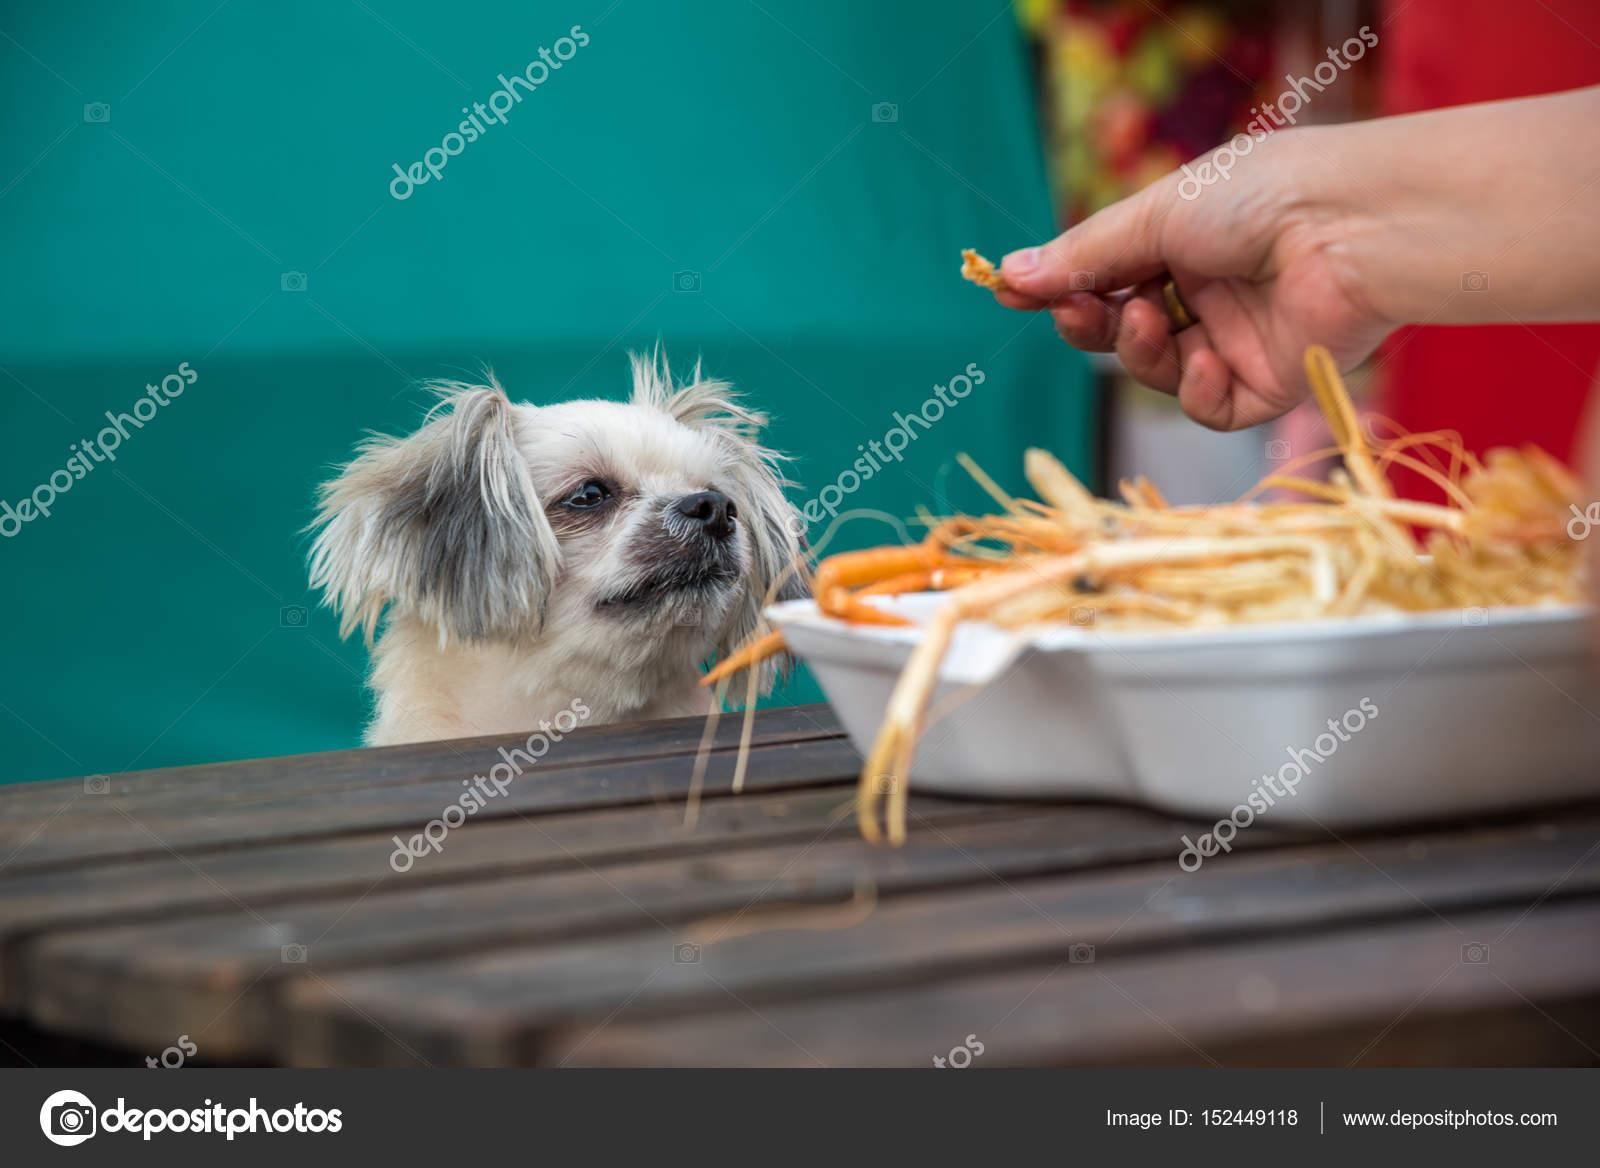 Dog Eat A Prawn Fried Shrimp Salt Feed Pet Owner Stock Photo